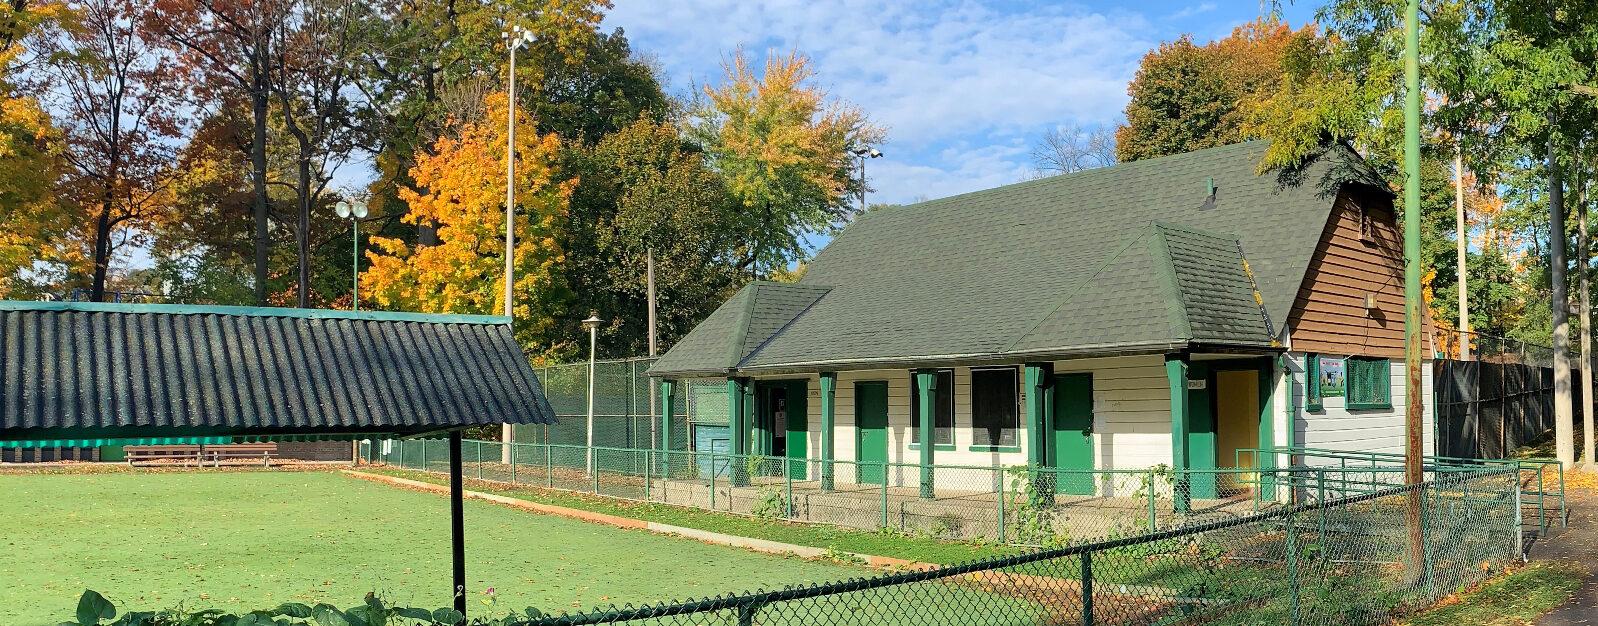 Community Events & Activities